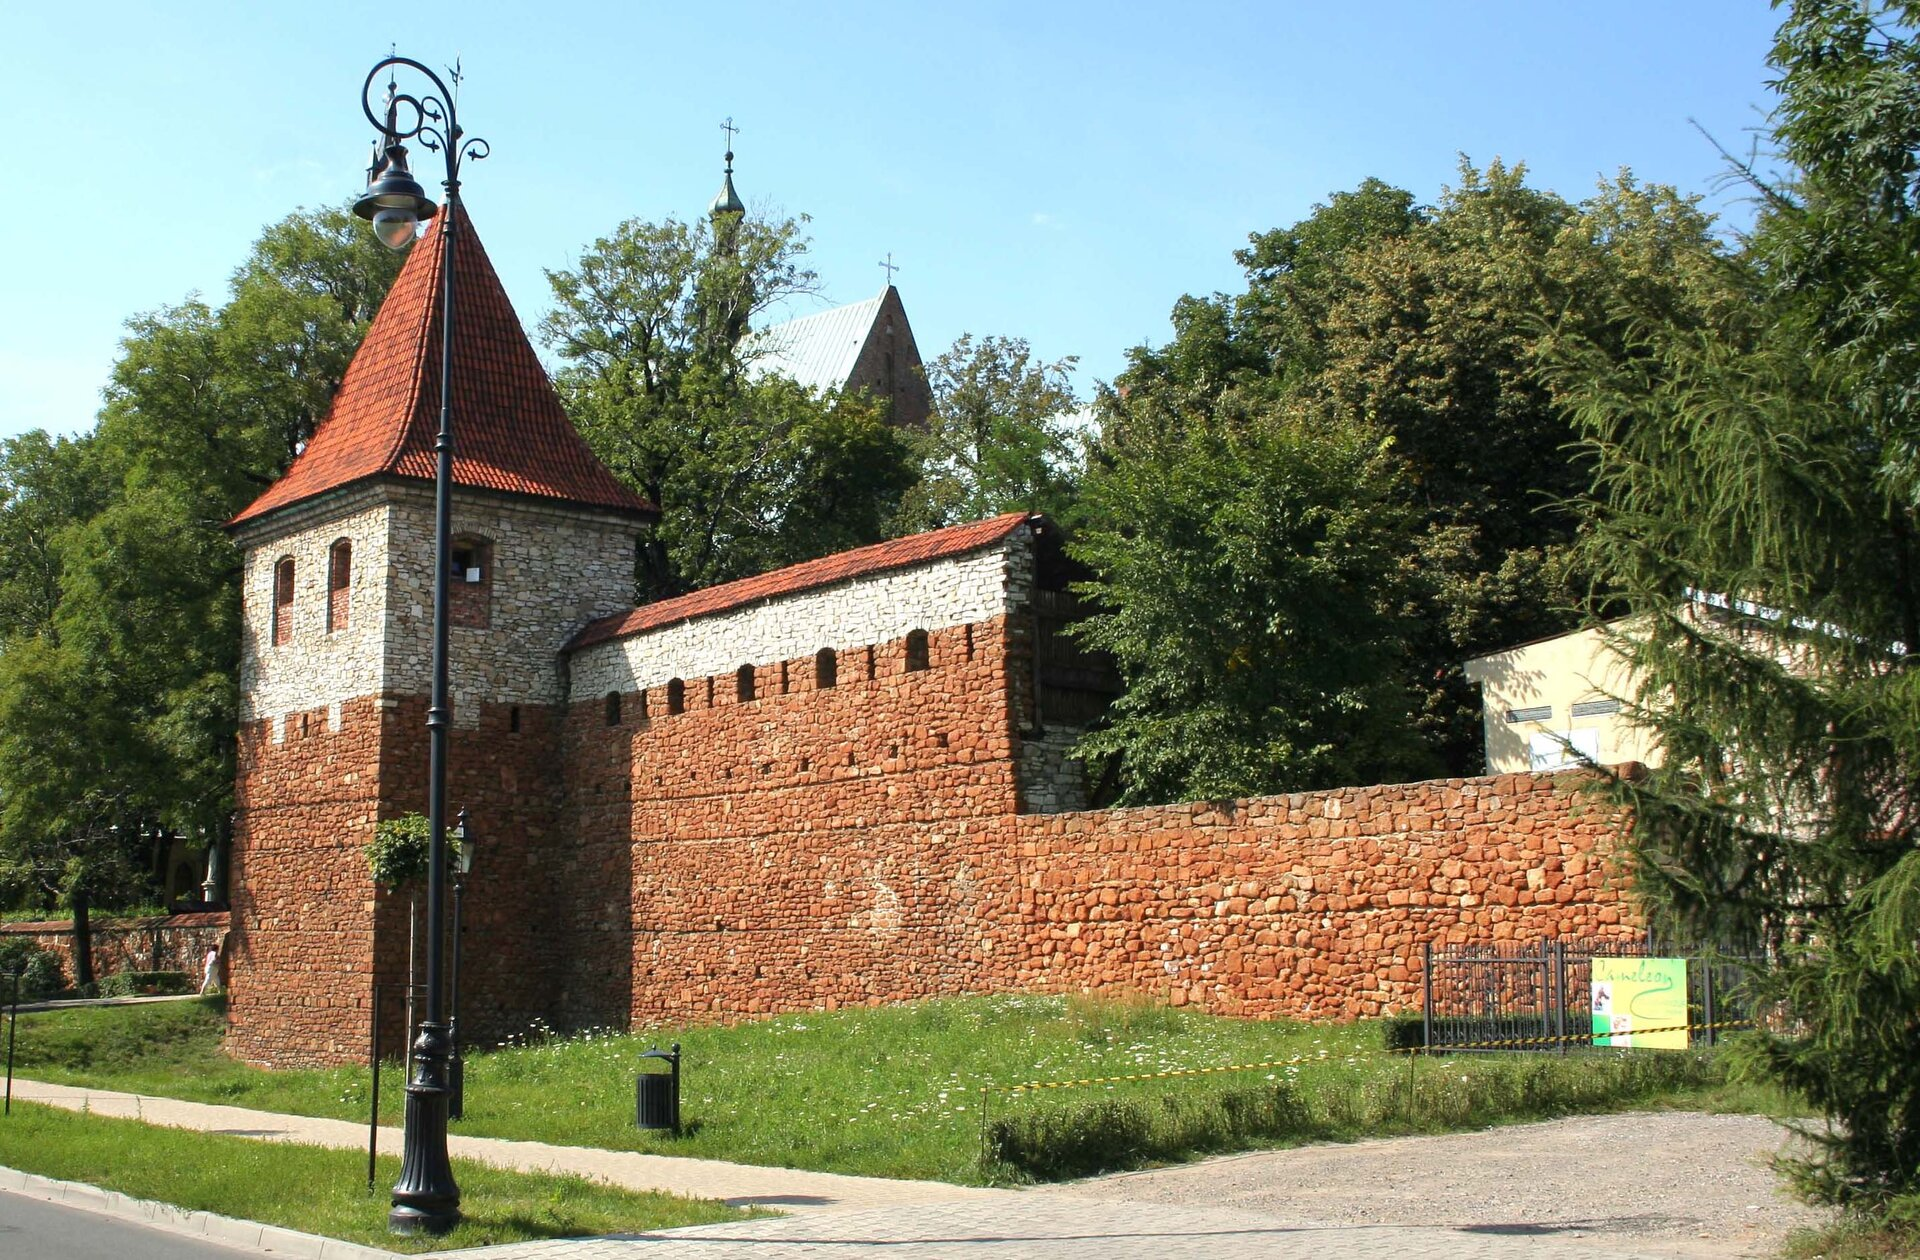 Mury obronne wOlkuszu Mury obronne wOlkuszu Źródło: Ufoizba, Wikimedia Commons, licencja: CC BY-SA 3.0.